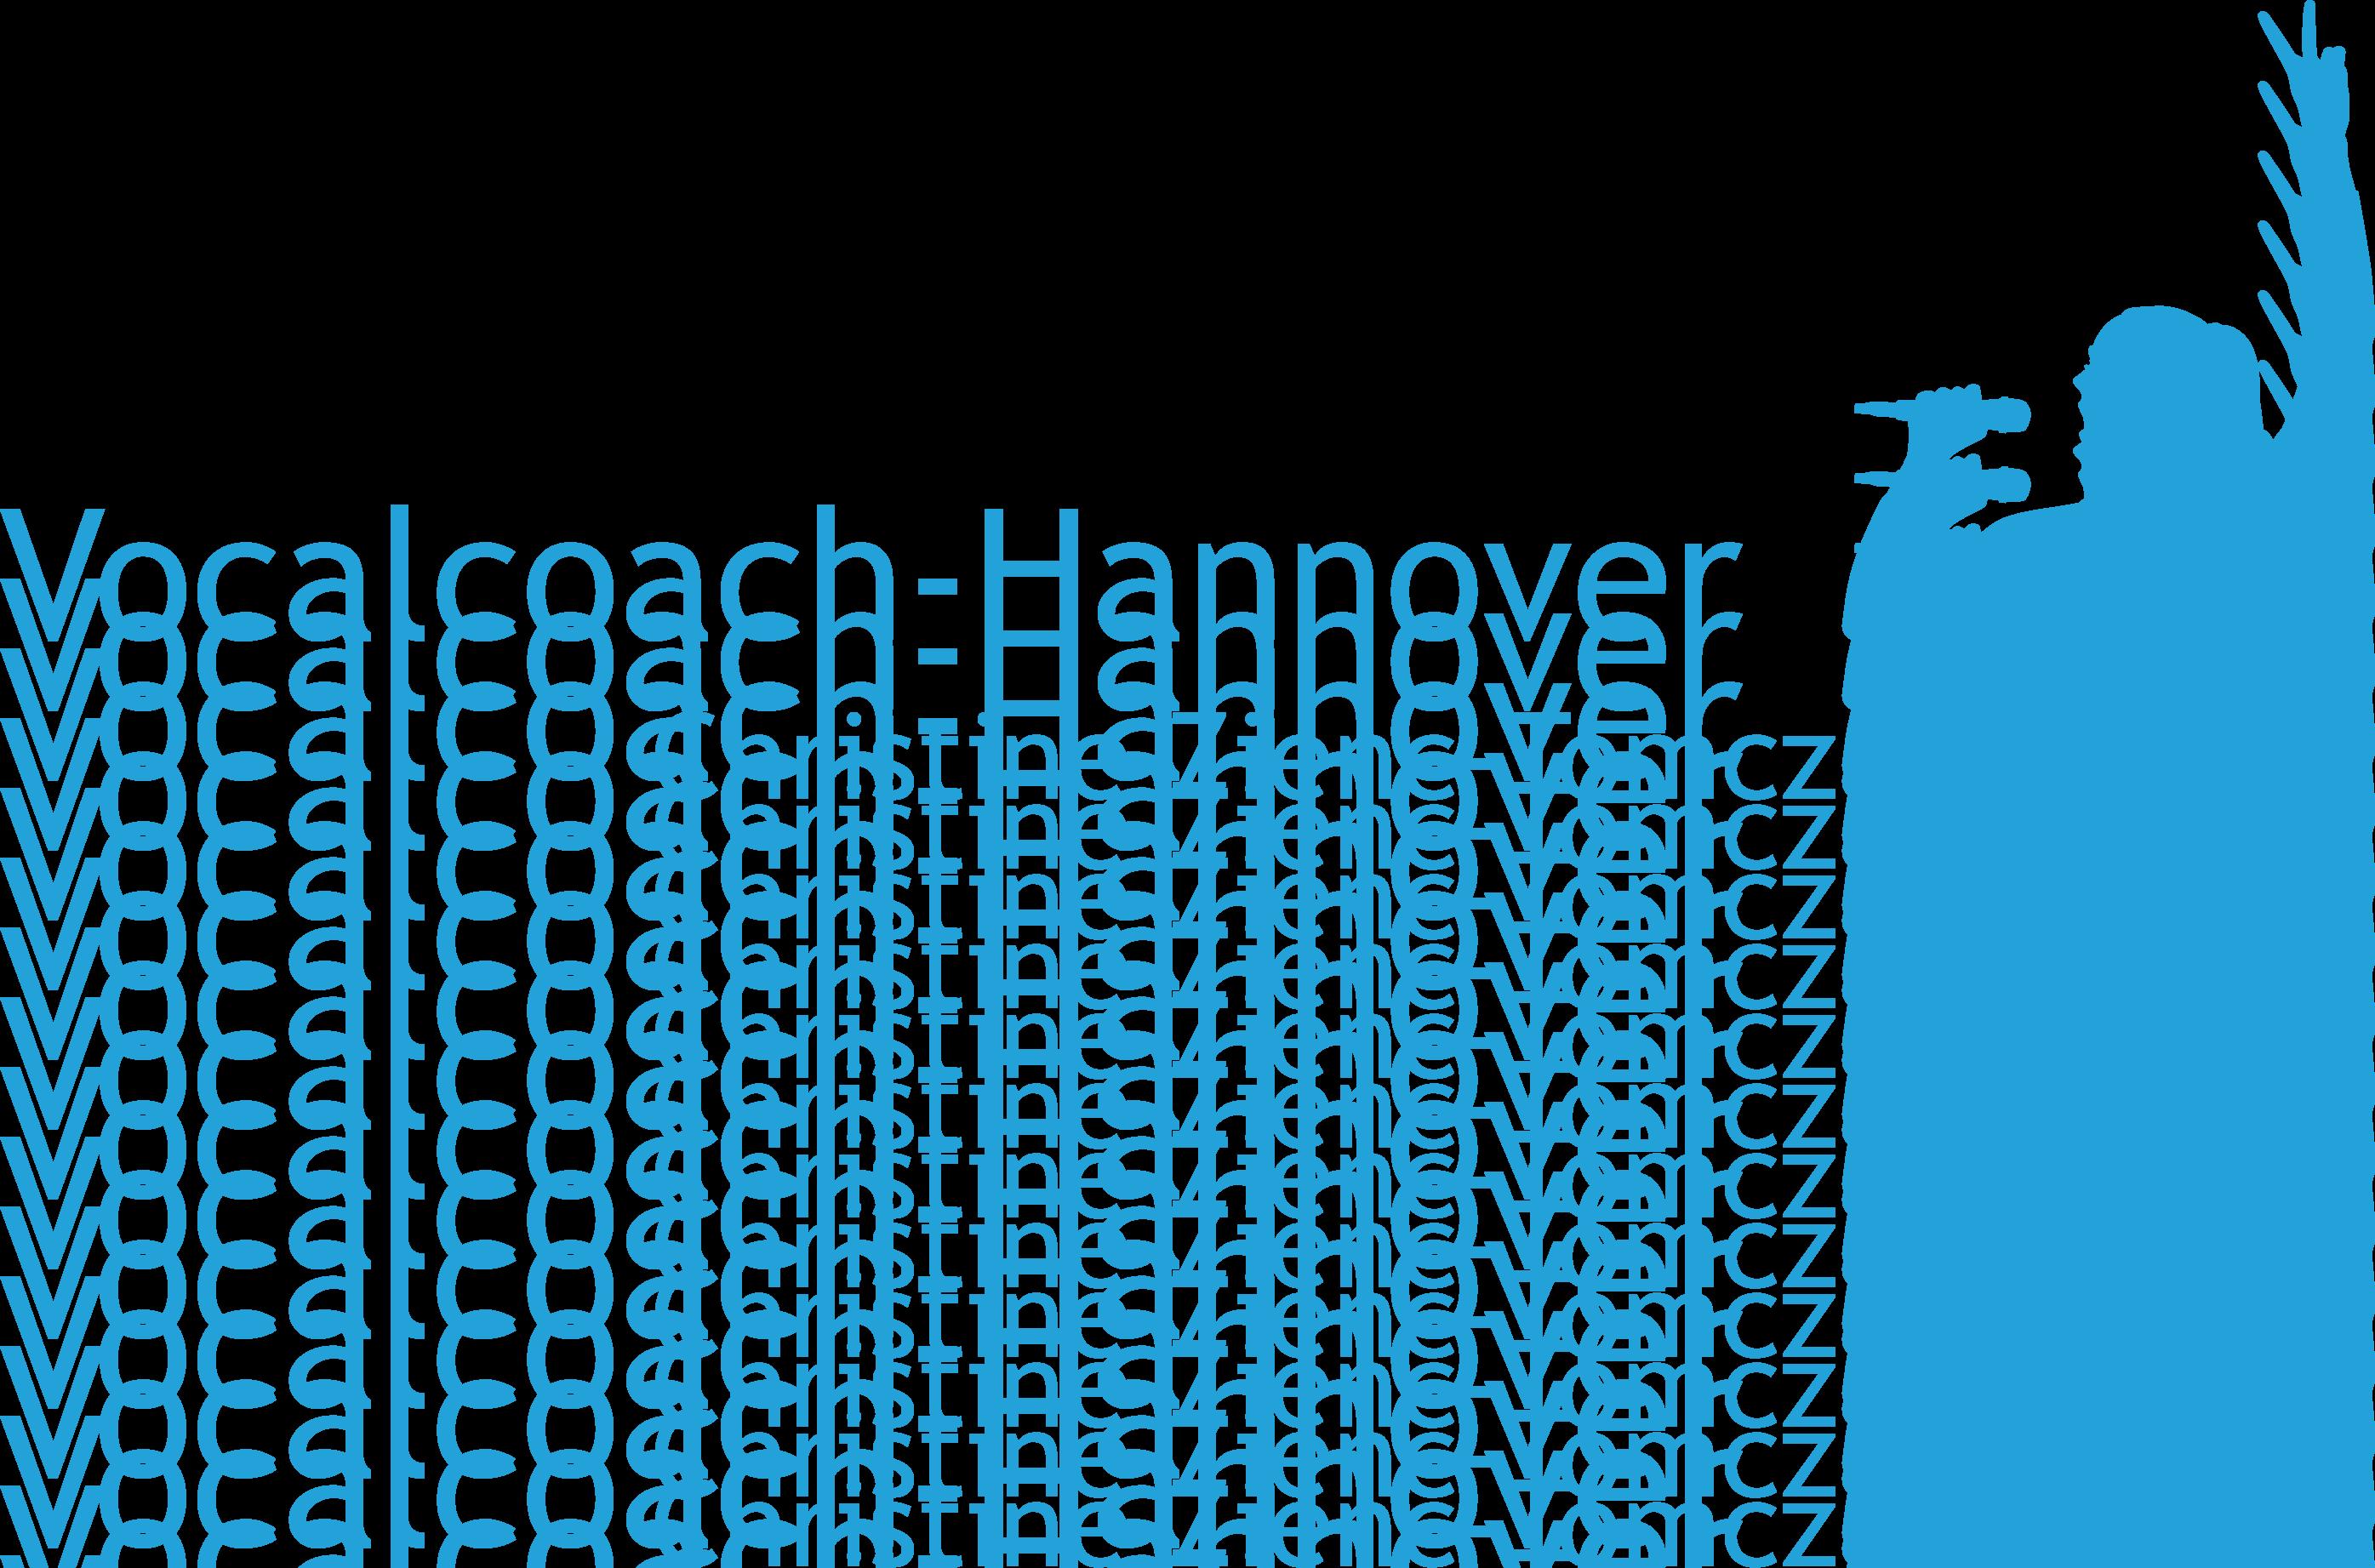 Vocalcoach-Hannover